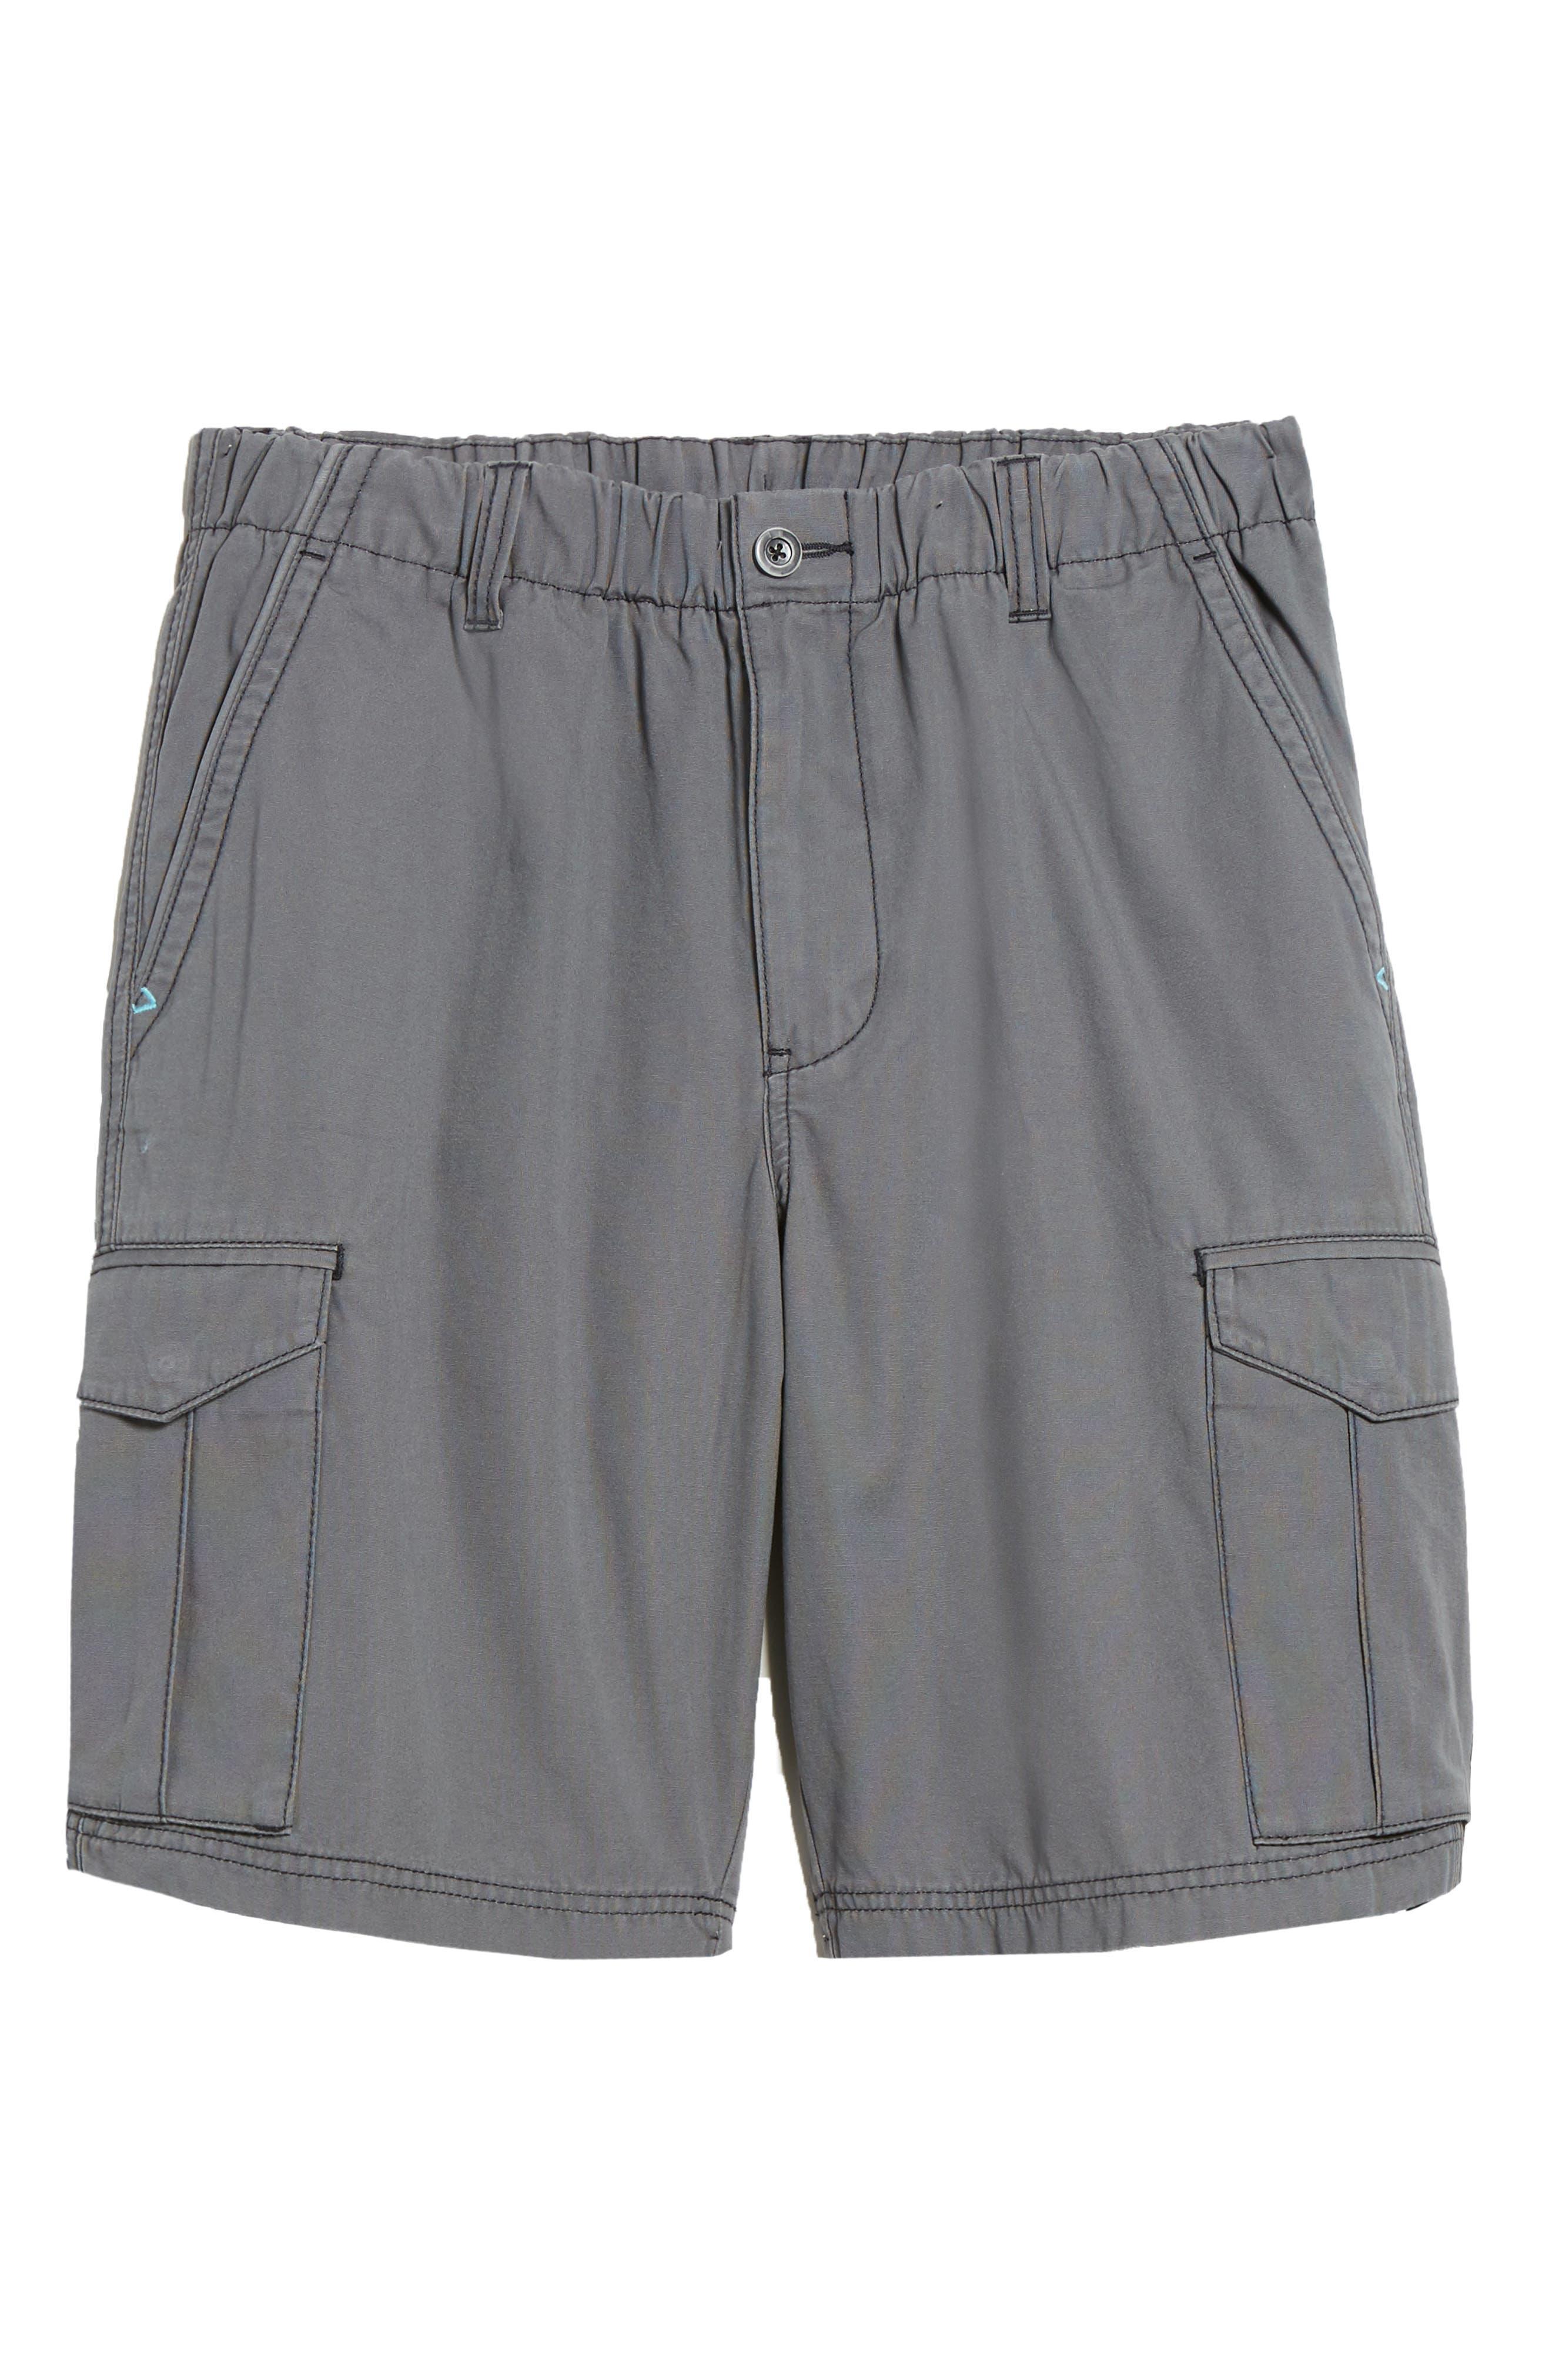 Island Survivalist Cargo Shorts,                             Alternate thumbnail 6, color,                             050